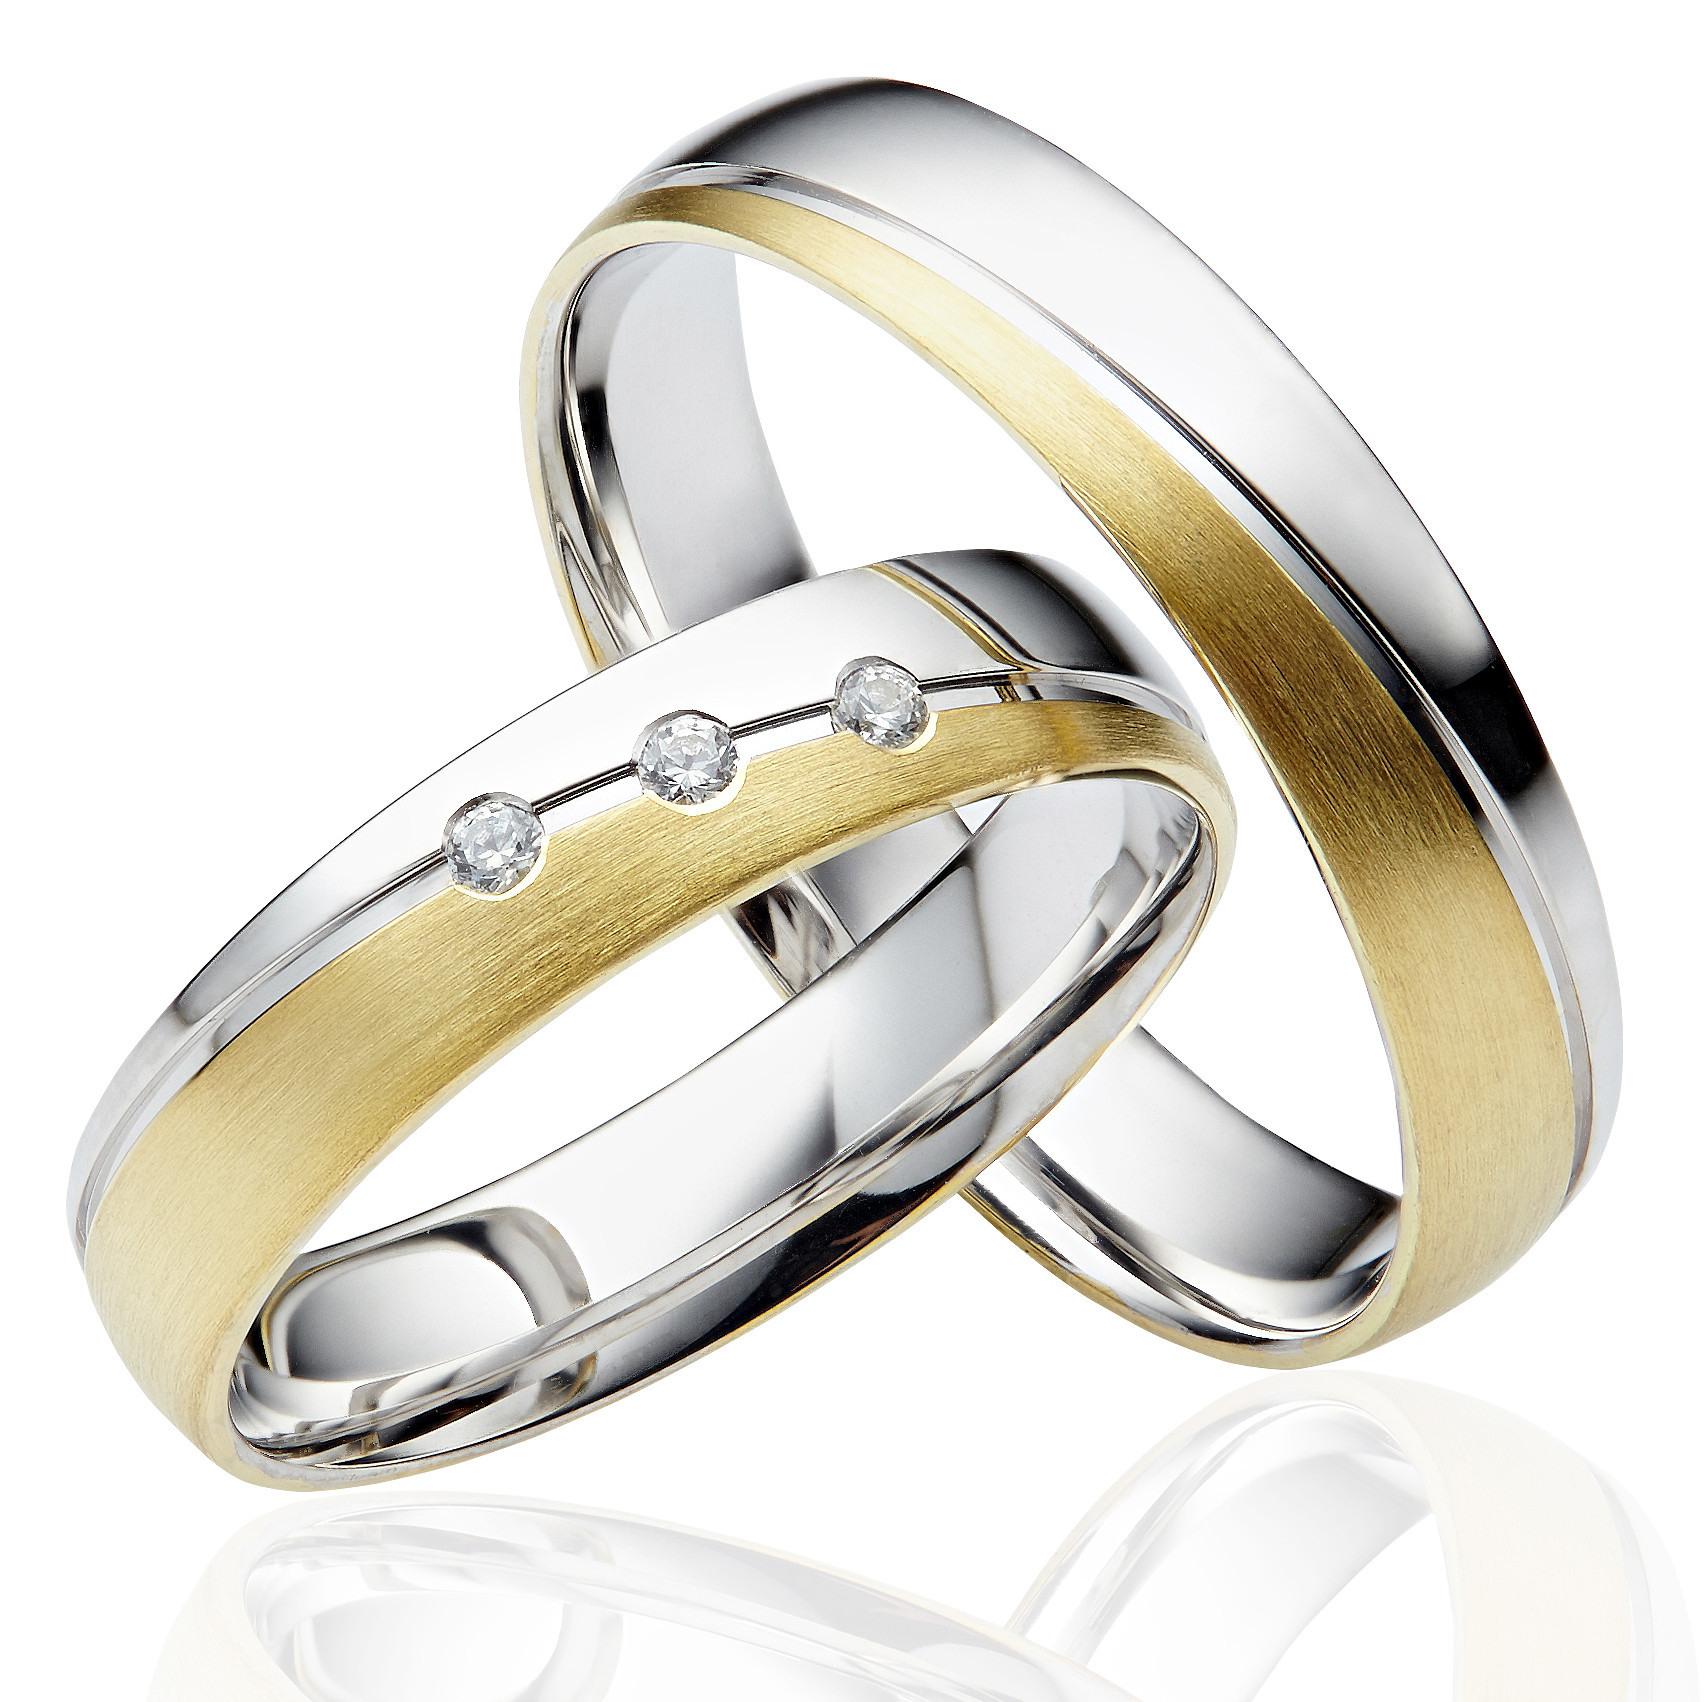 100+ [ Eheringe Gold Paarpreis ] | Trauringe Weissgold